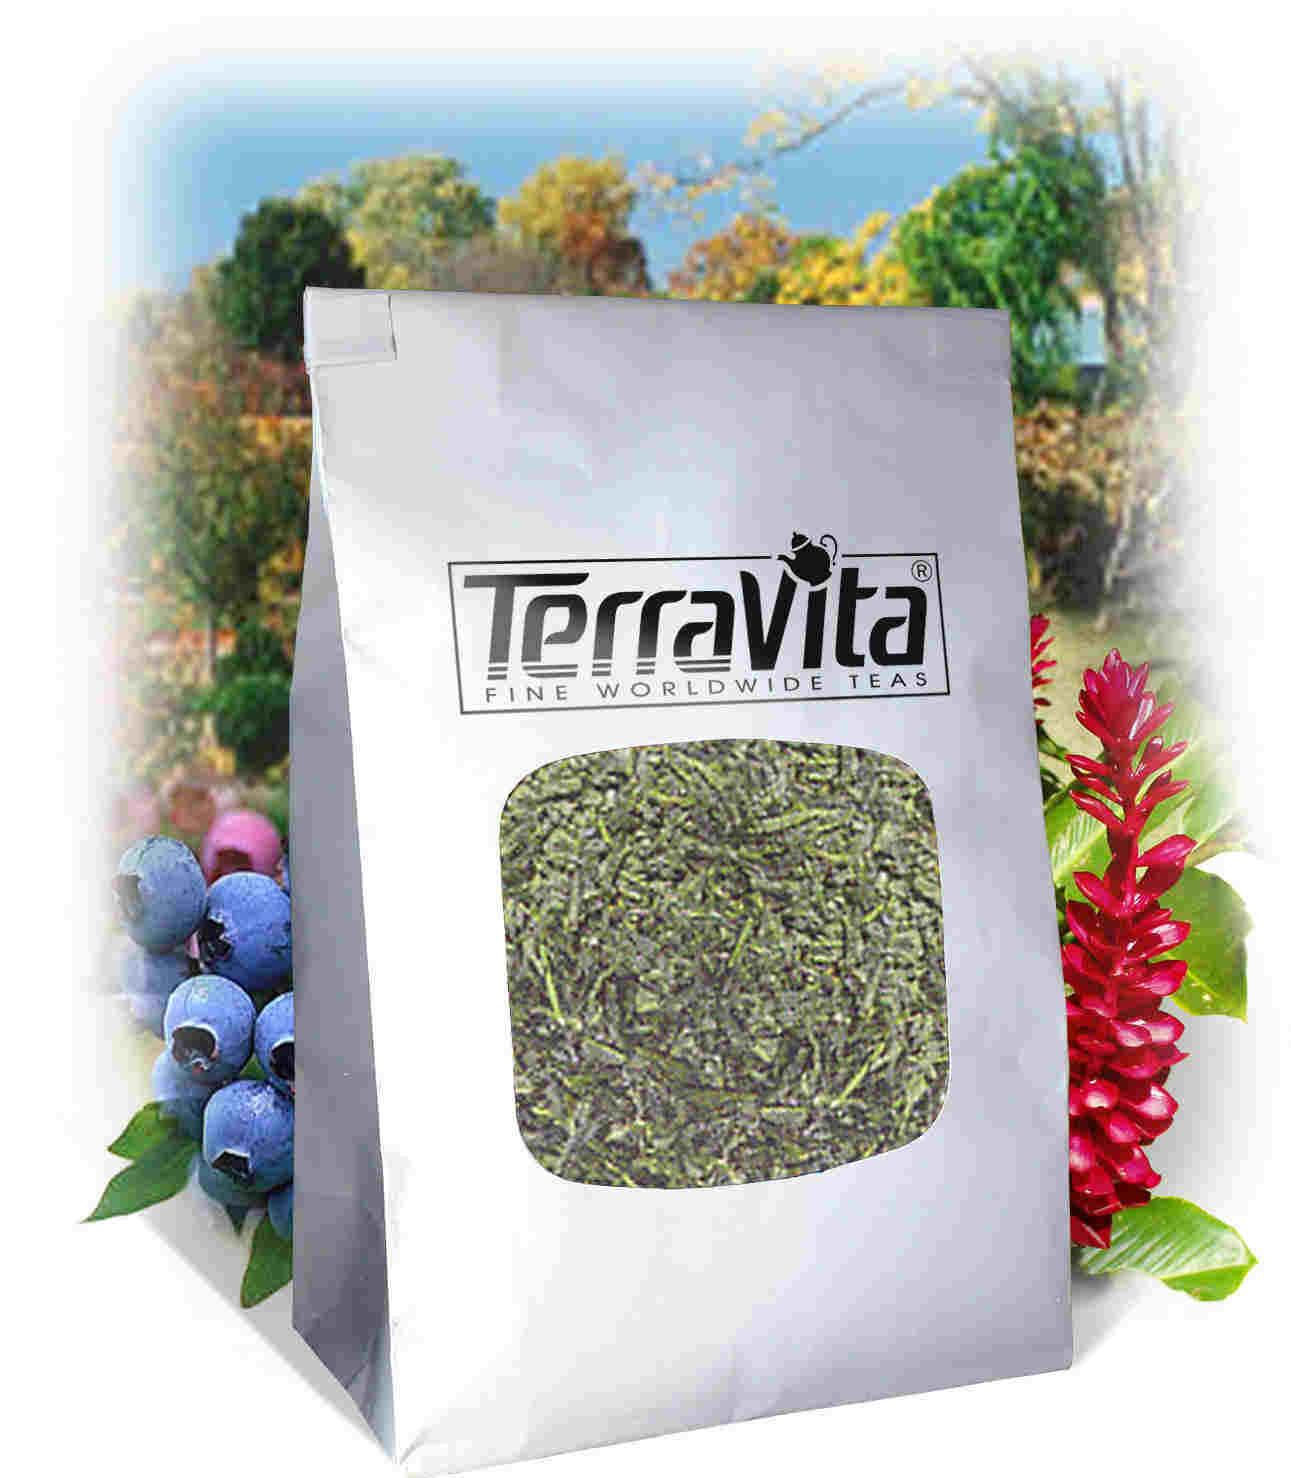 Irritable Bowel Support (IBS) - Agrimony, Psyllium and Carrot - Tea (Loose)